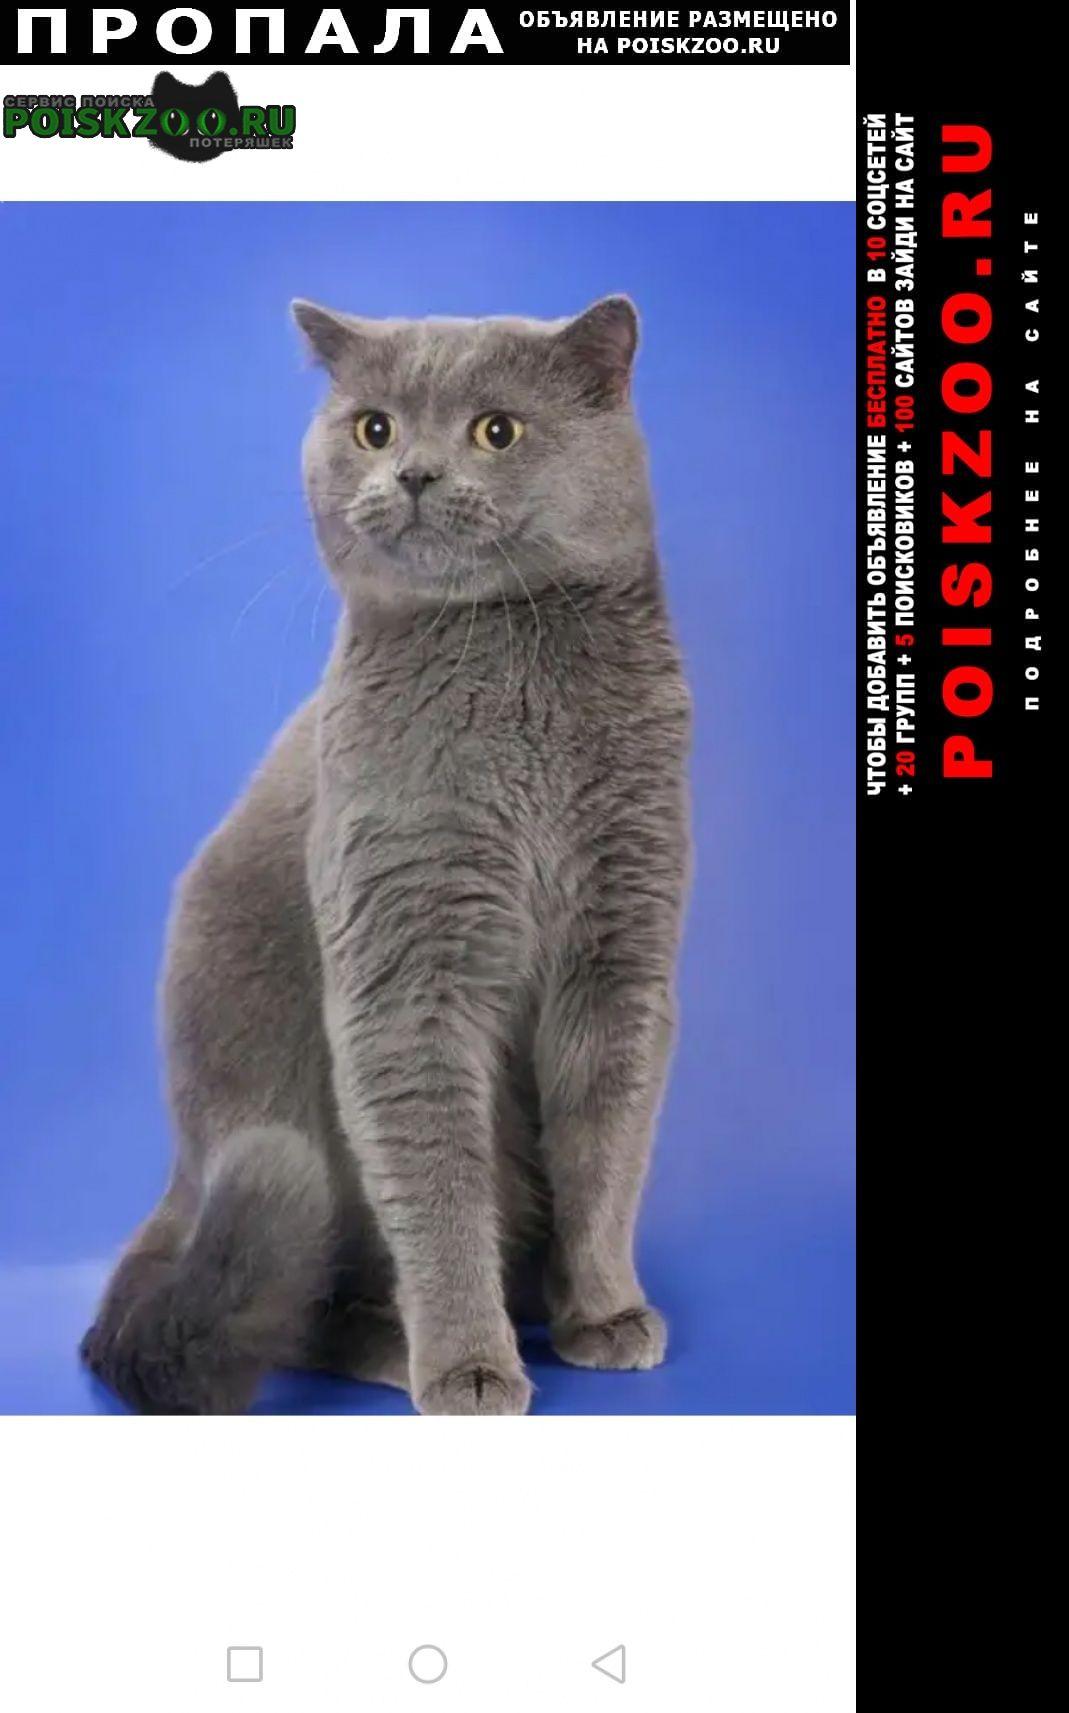 Москва Пропала кошка в жк юрлово